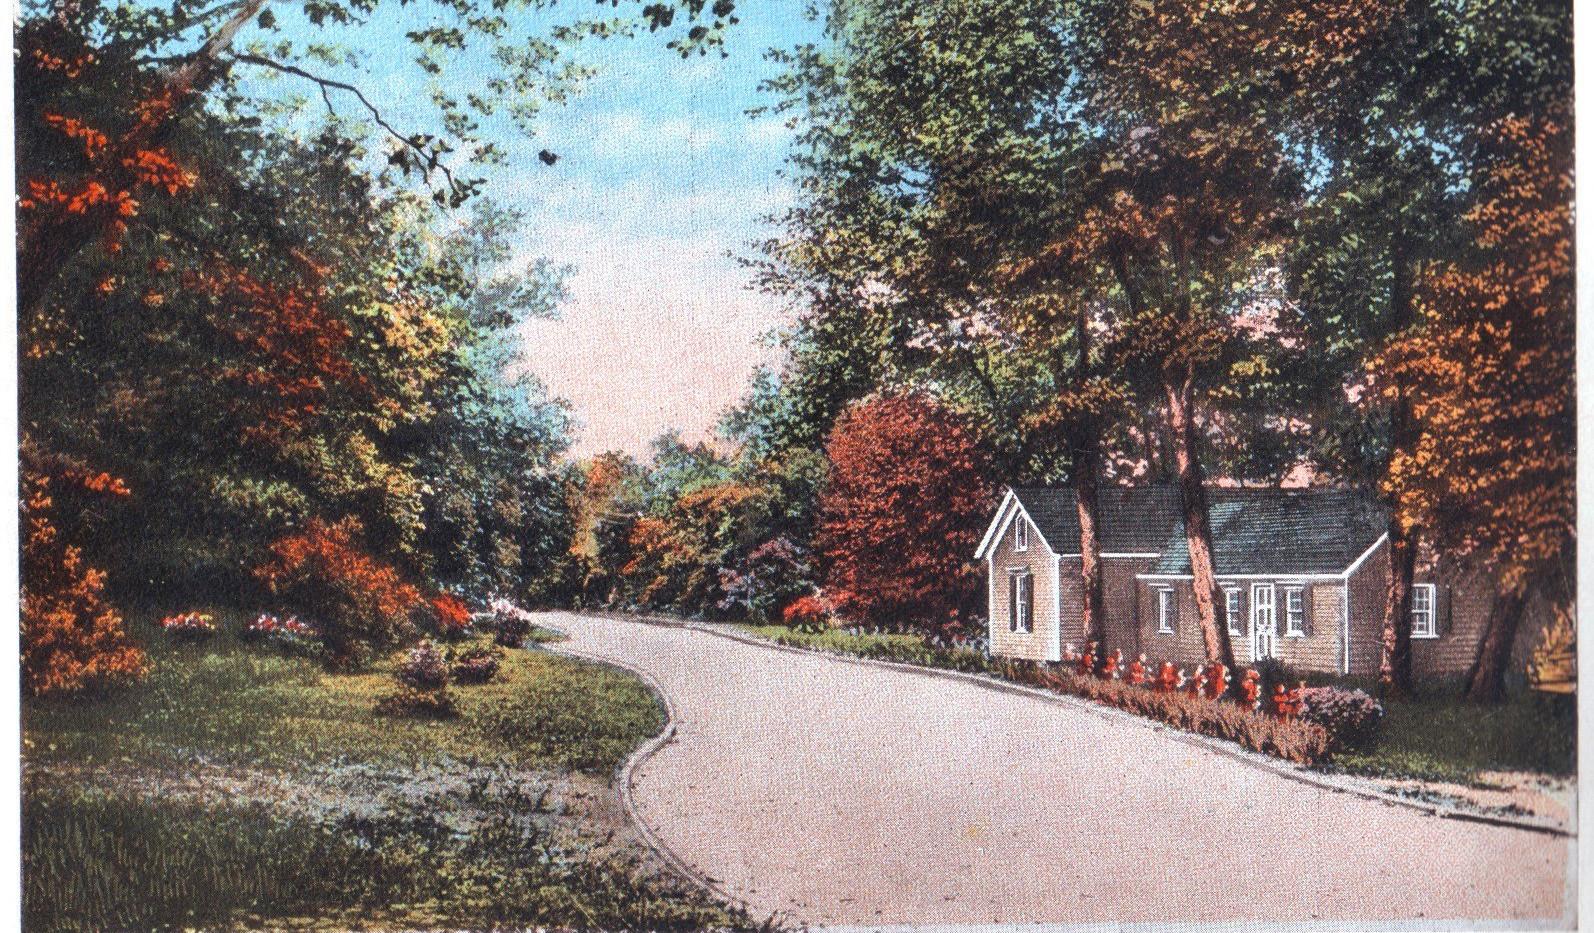 Nail House Postcard Image